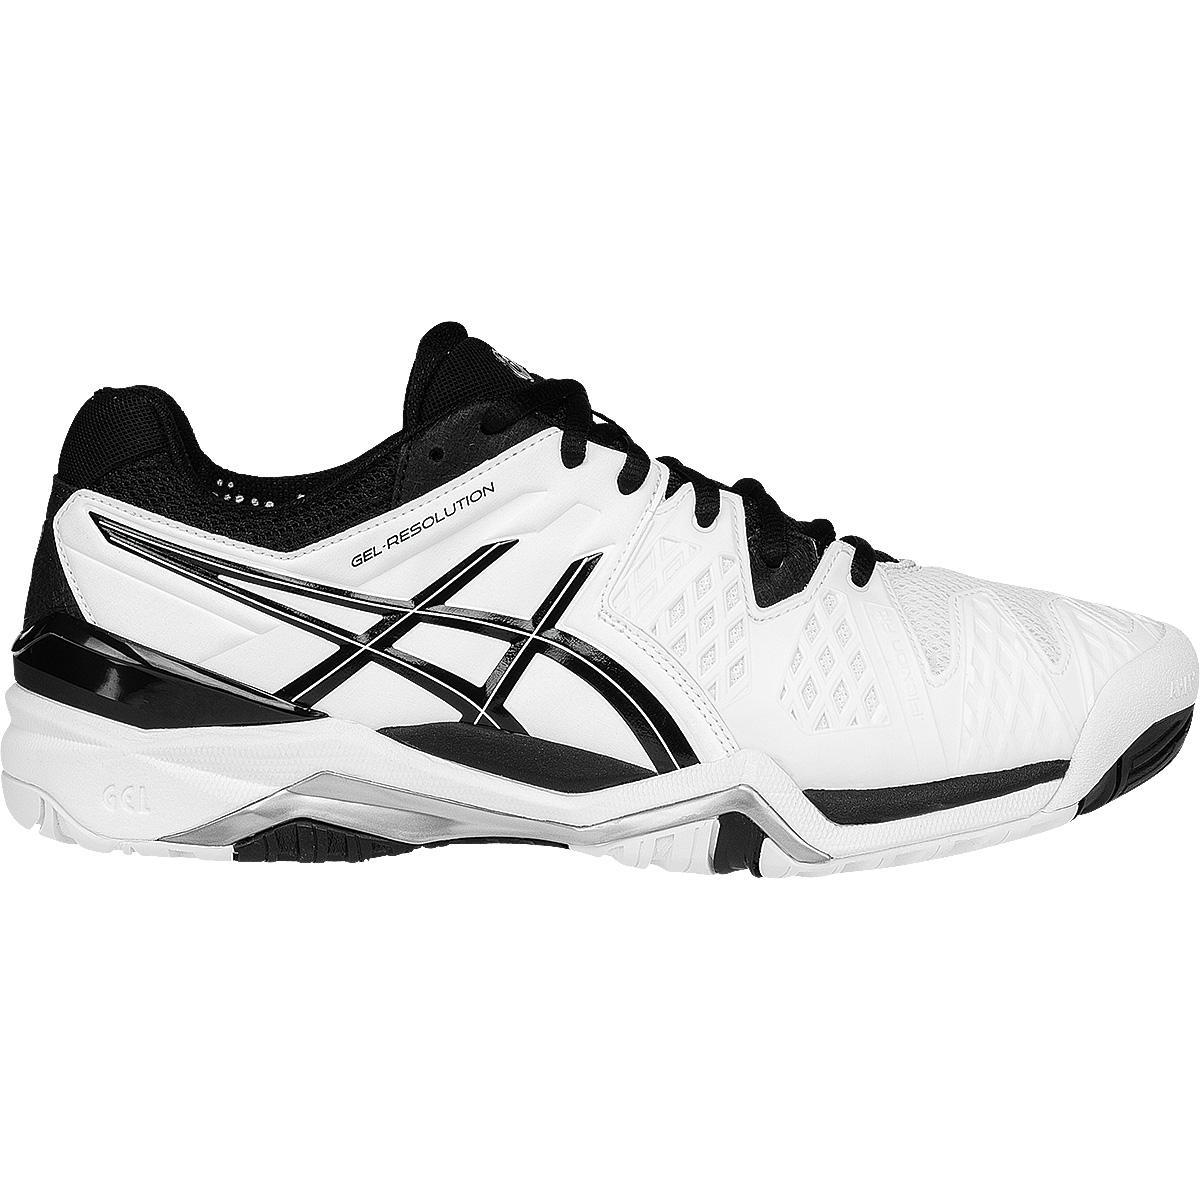 Asics Mens GEL Resolution 6 Tennis Shoes WhiteBlackSilver